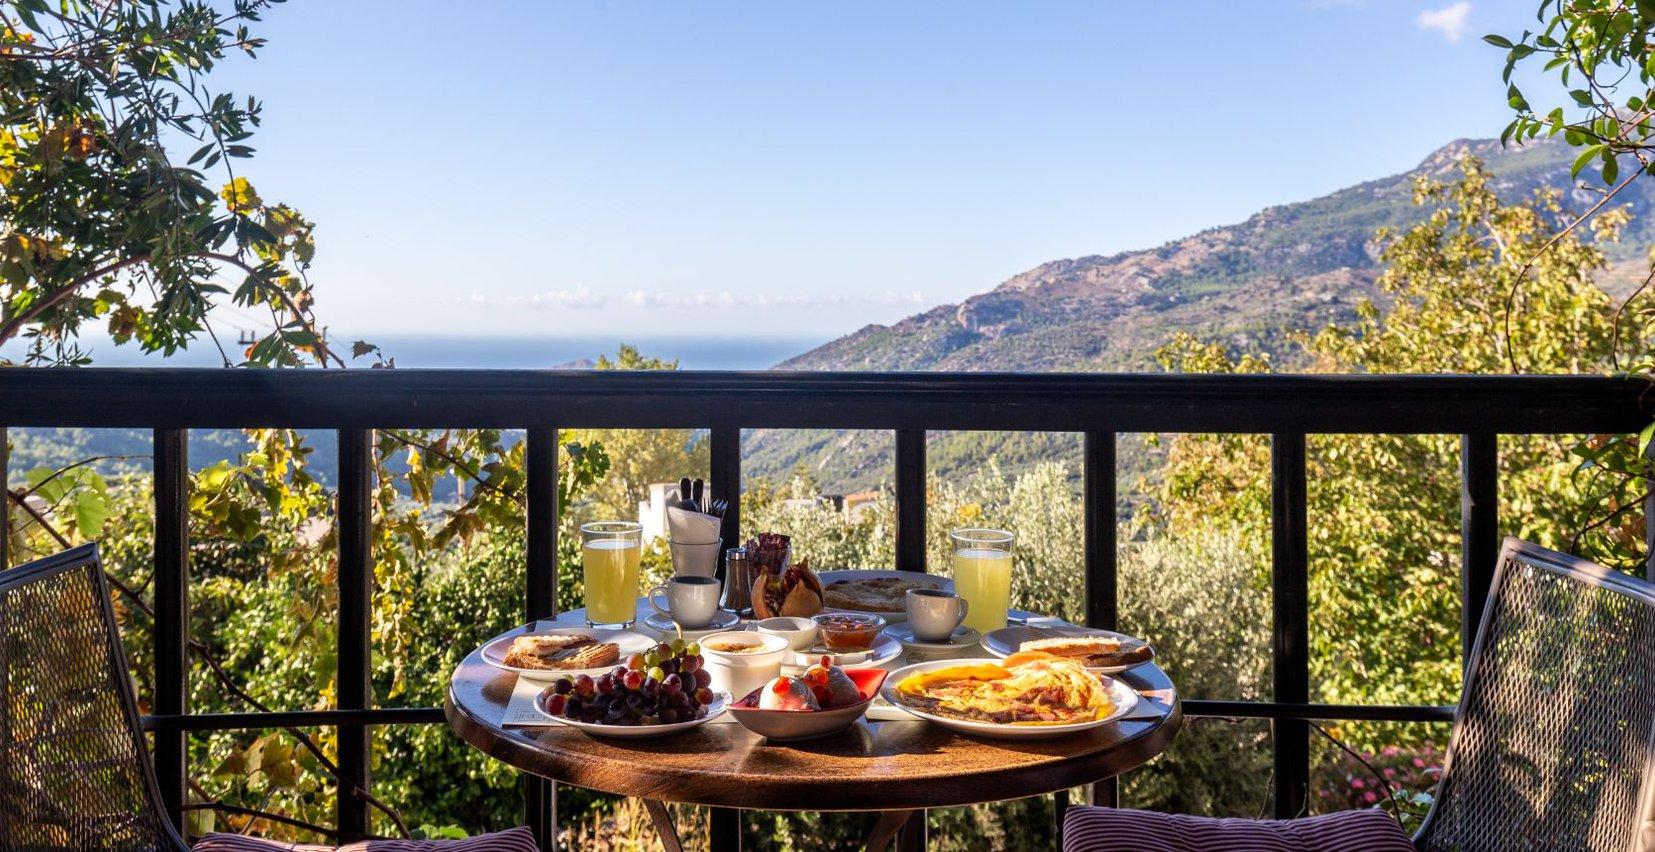 The rich breakfast of Mala Villa in Crete